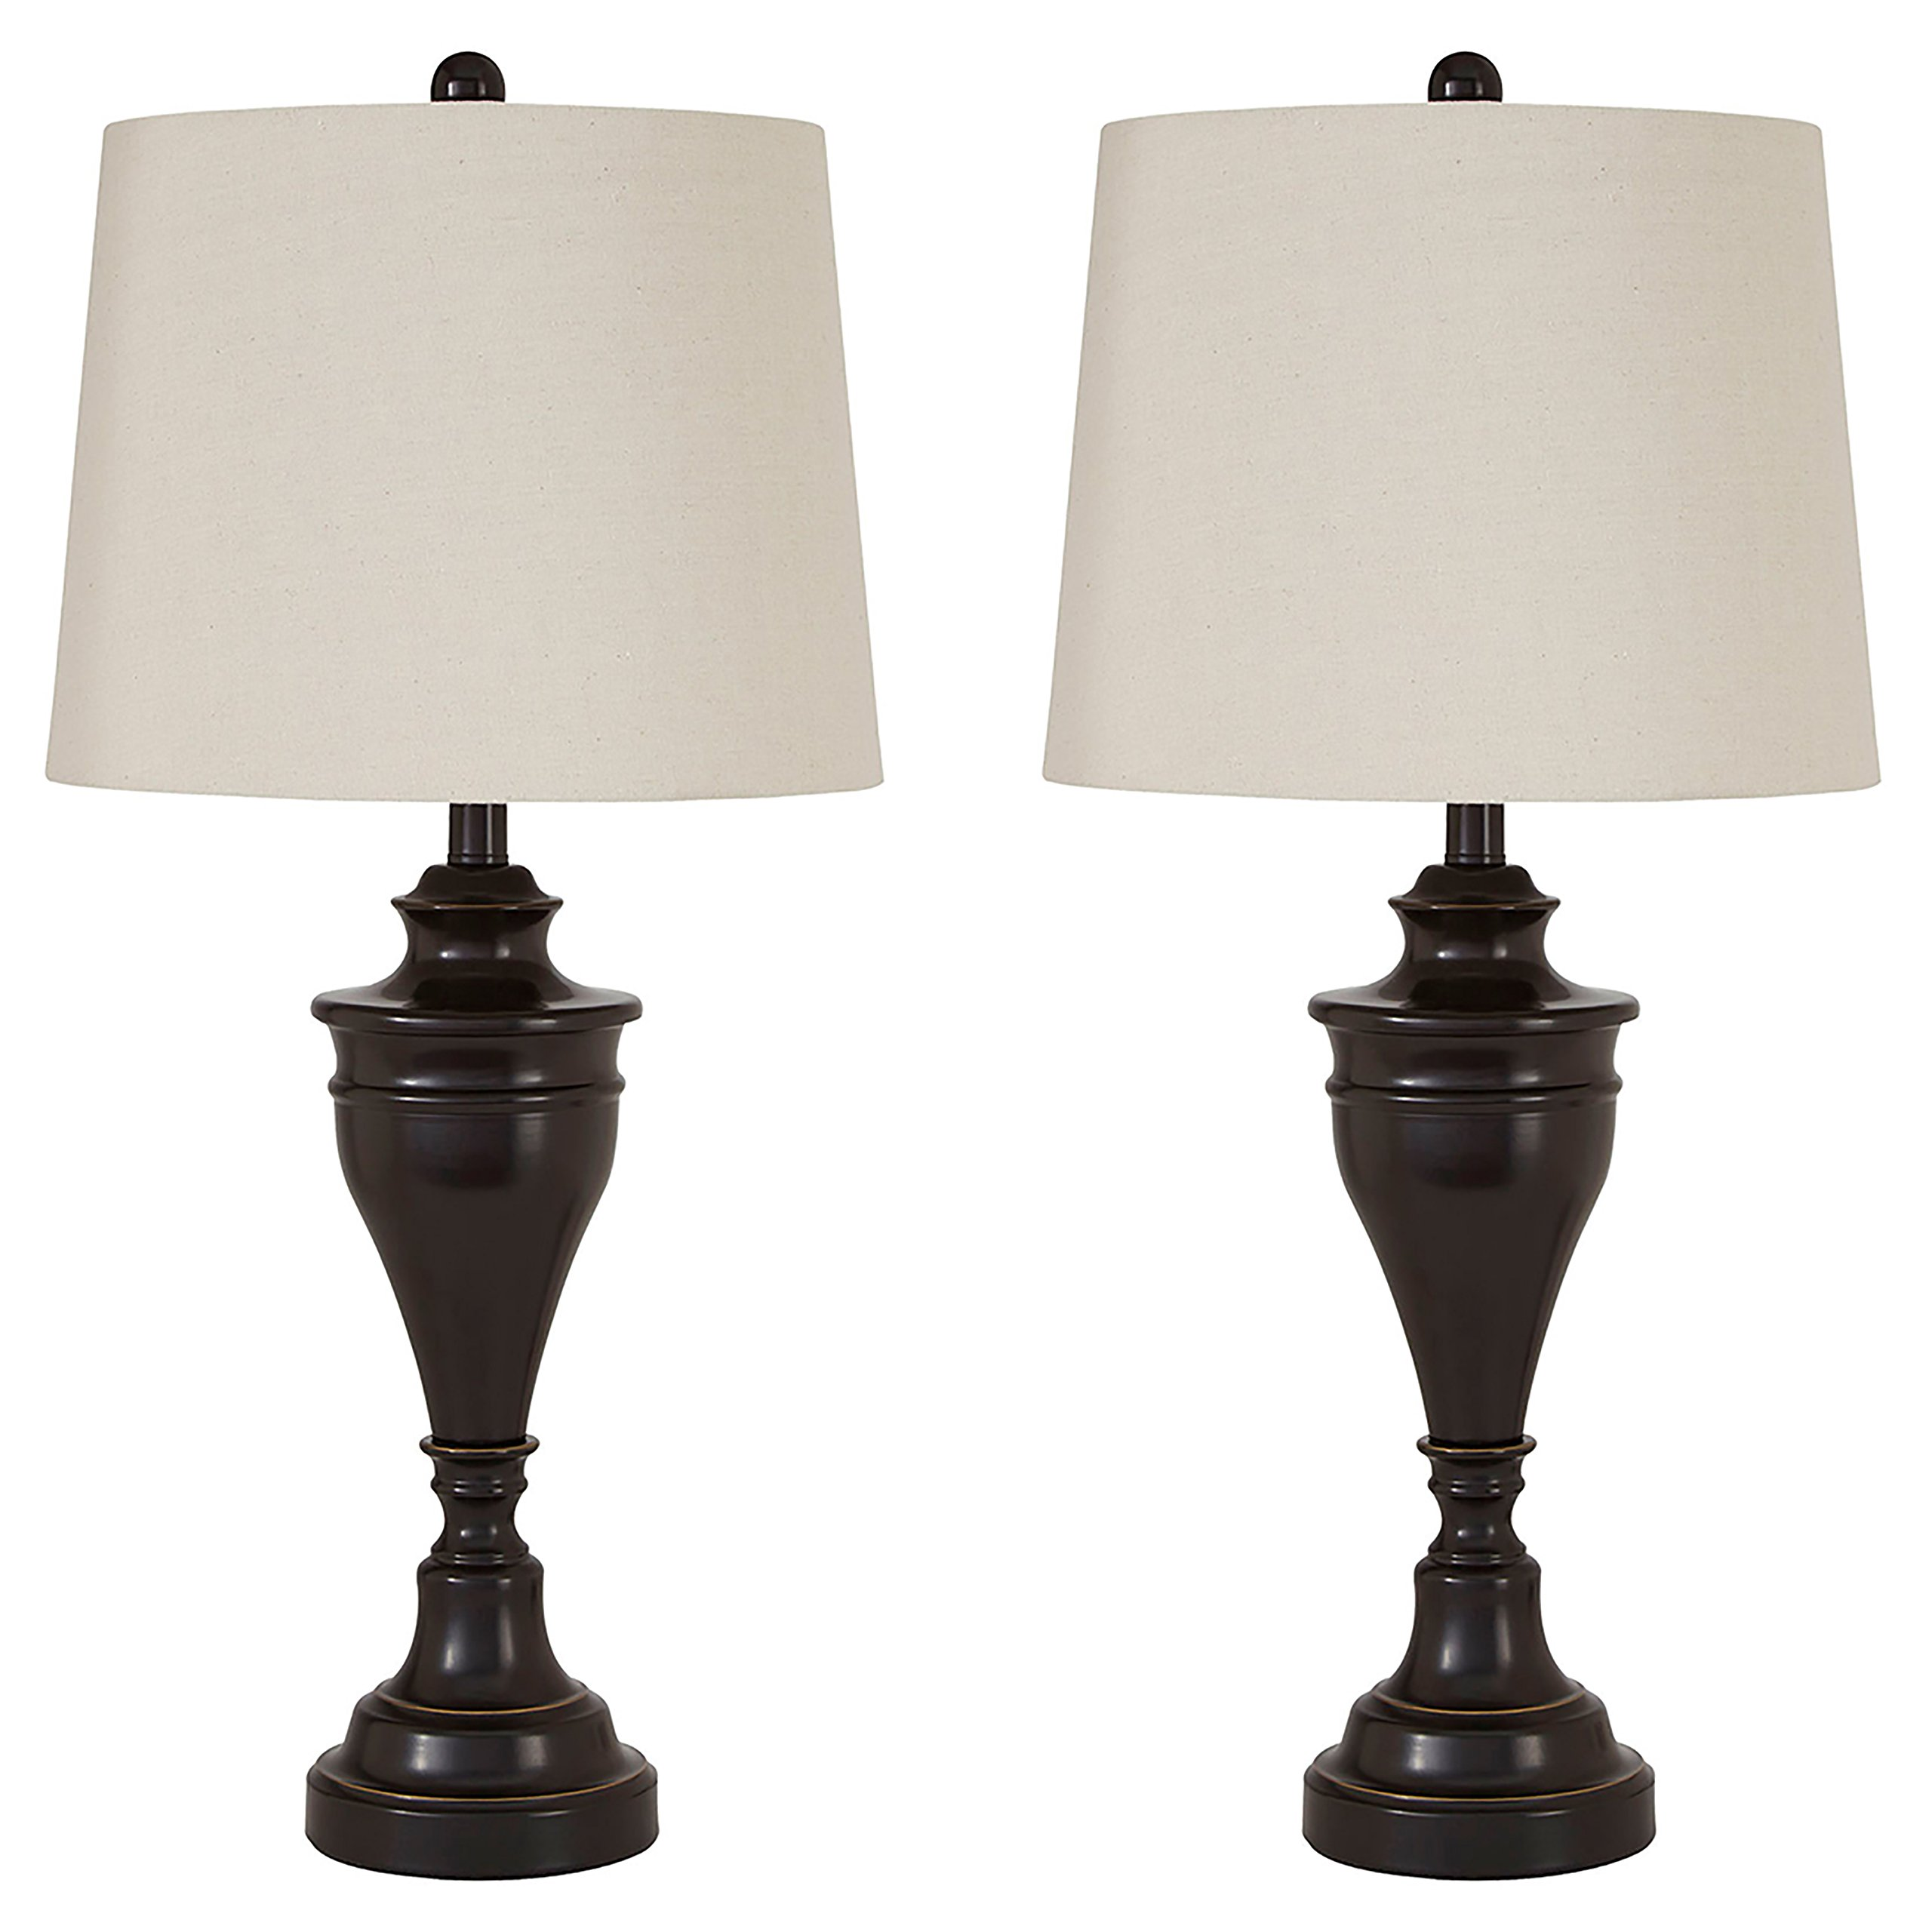 Ashley Furniture Signature Design -  Darlita Table Lamps Set of 2 - Contemporary - Bronze Finish